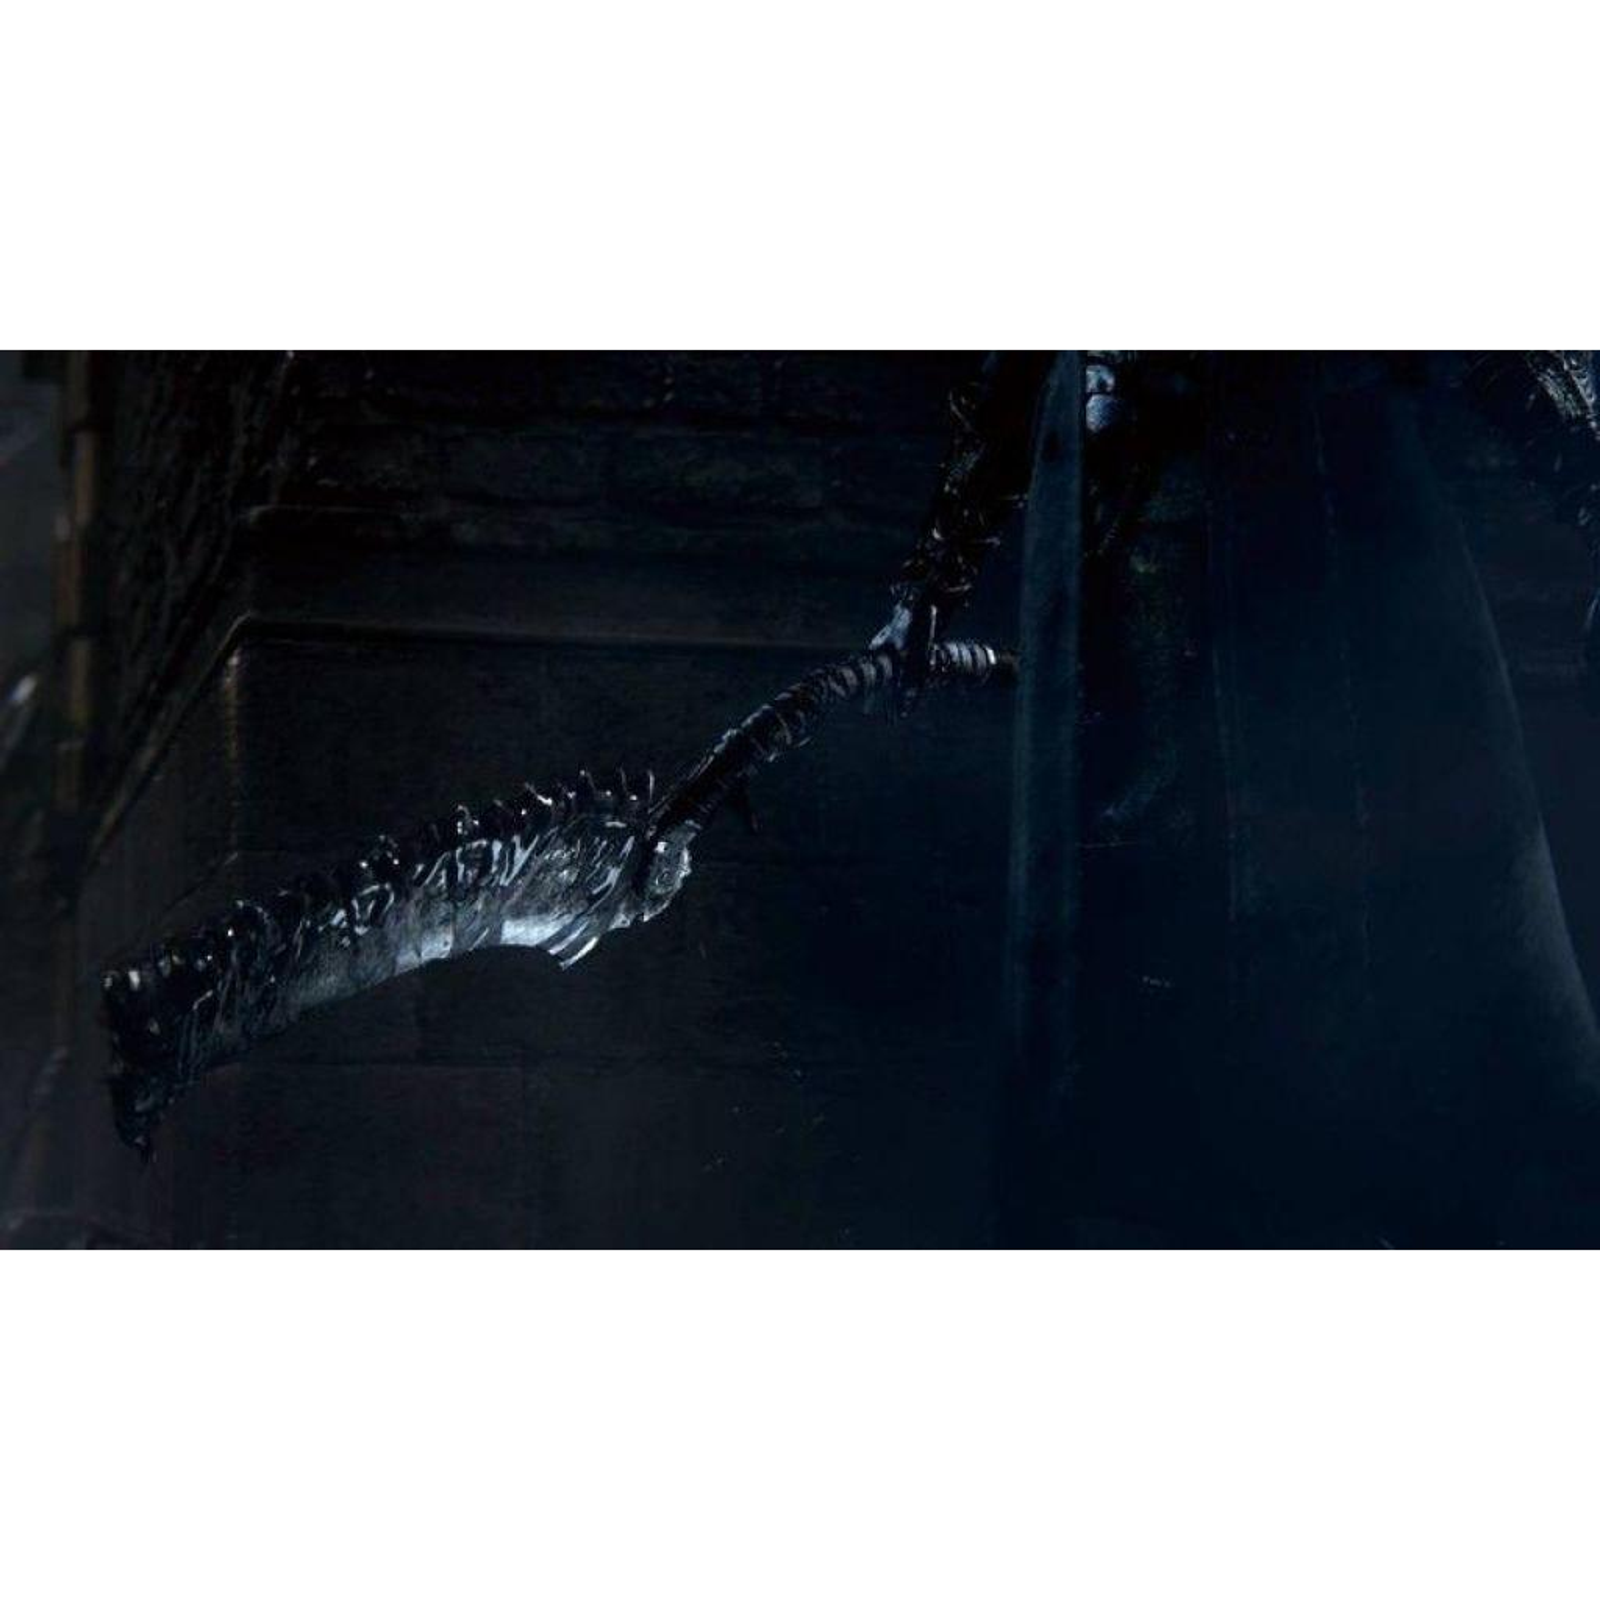 Игра SONY Bloodborne[PS4,Russiansubtitles]Blu-rayдиск (9438472) изображение 2